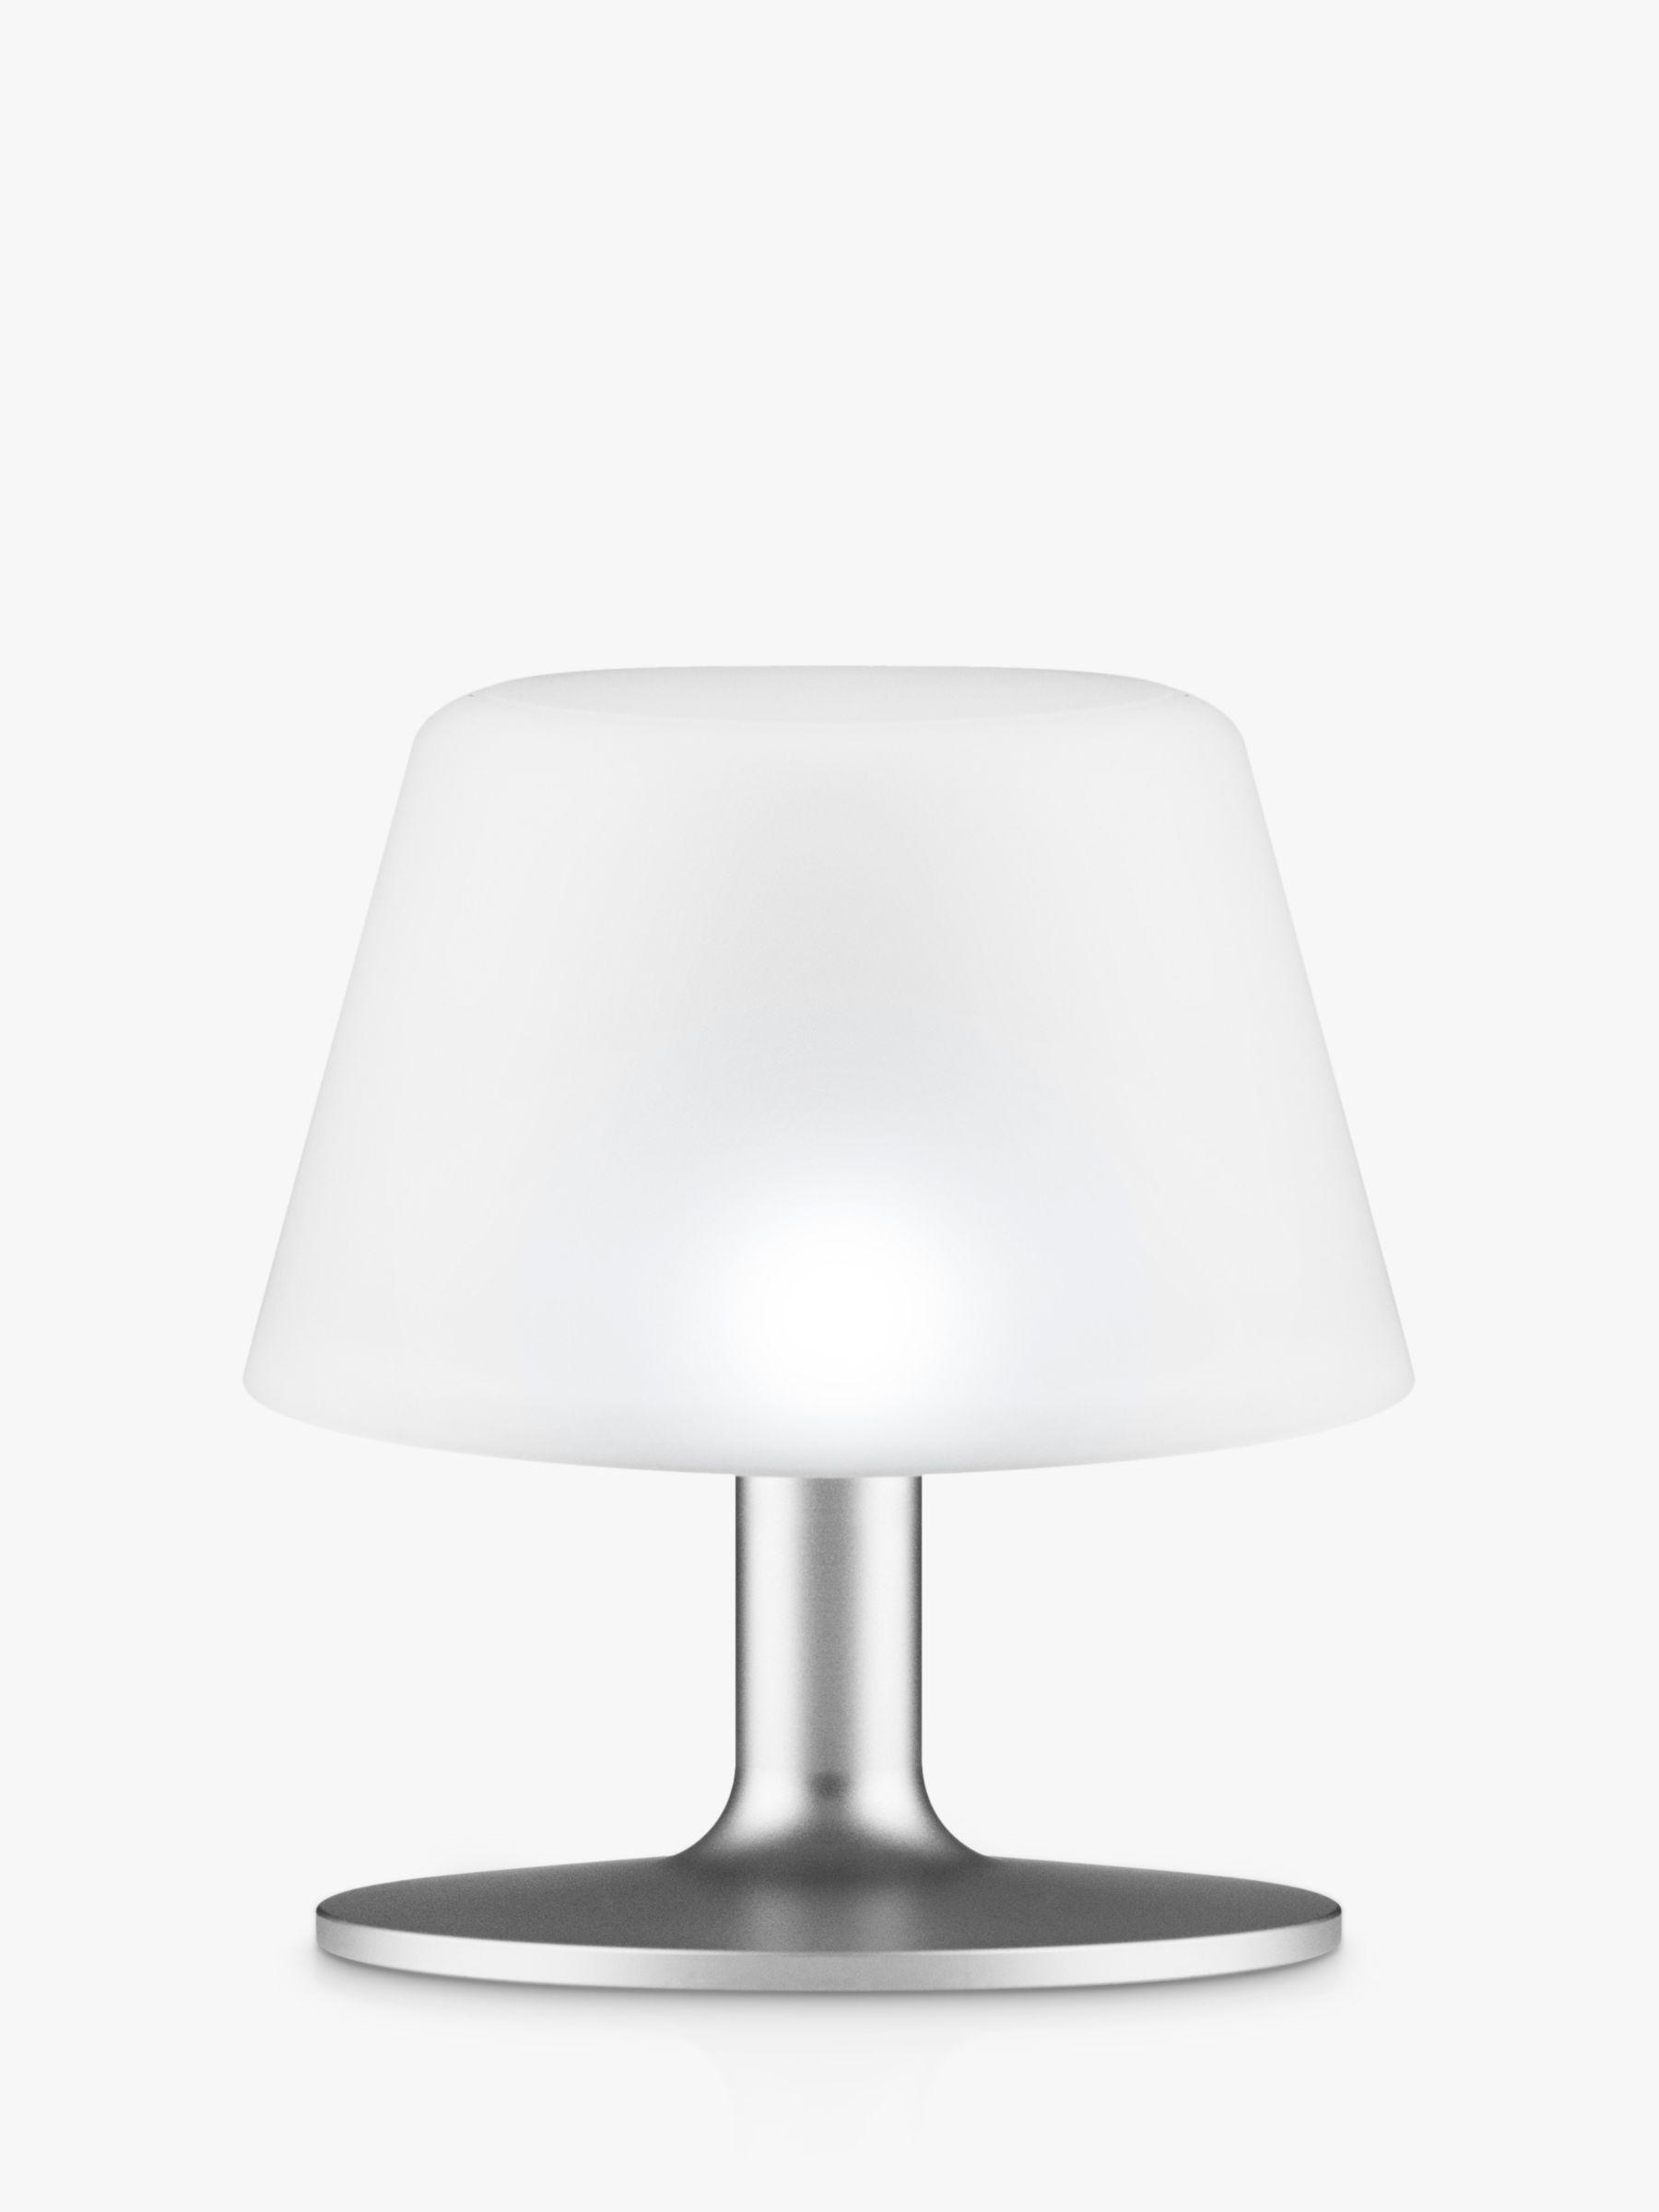 Eva Solo Eva Solo SunLight Solar LED Outdoor Lamp